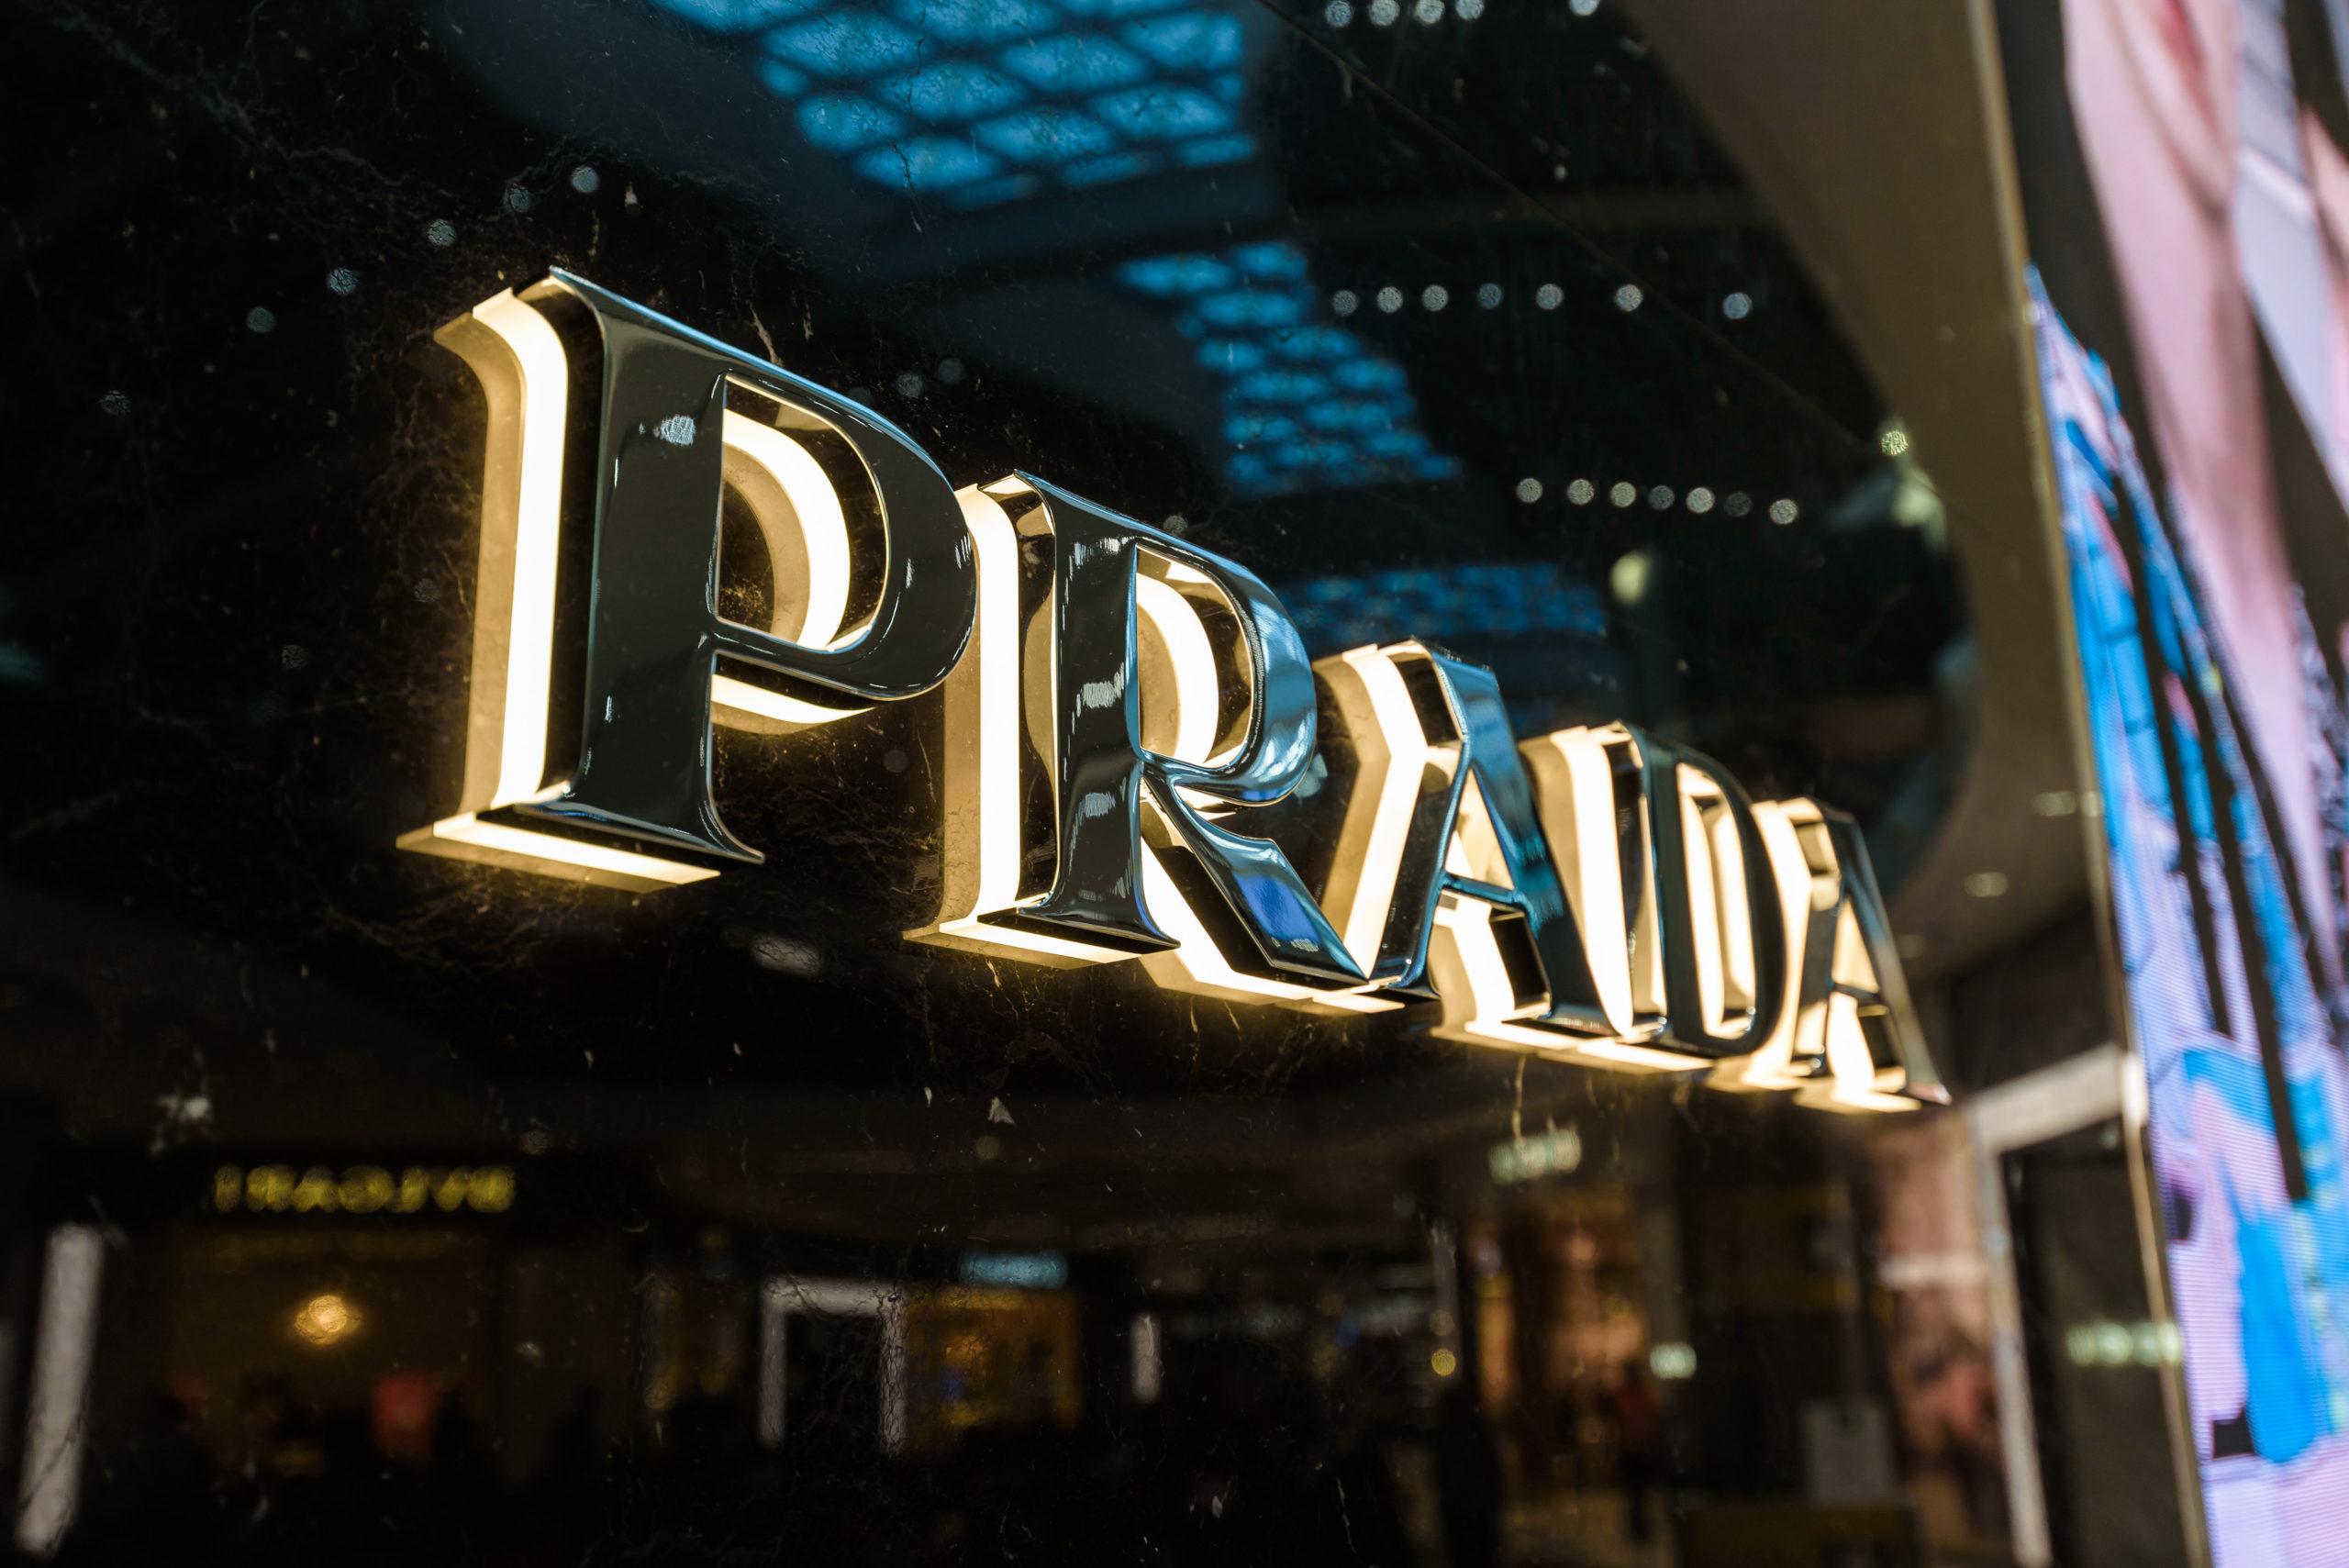 Prada New Headquarter in Tuscany